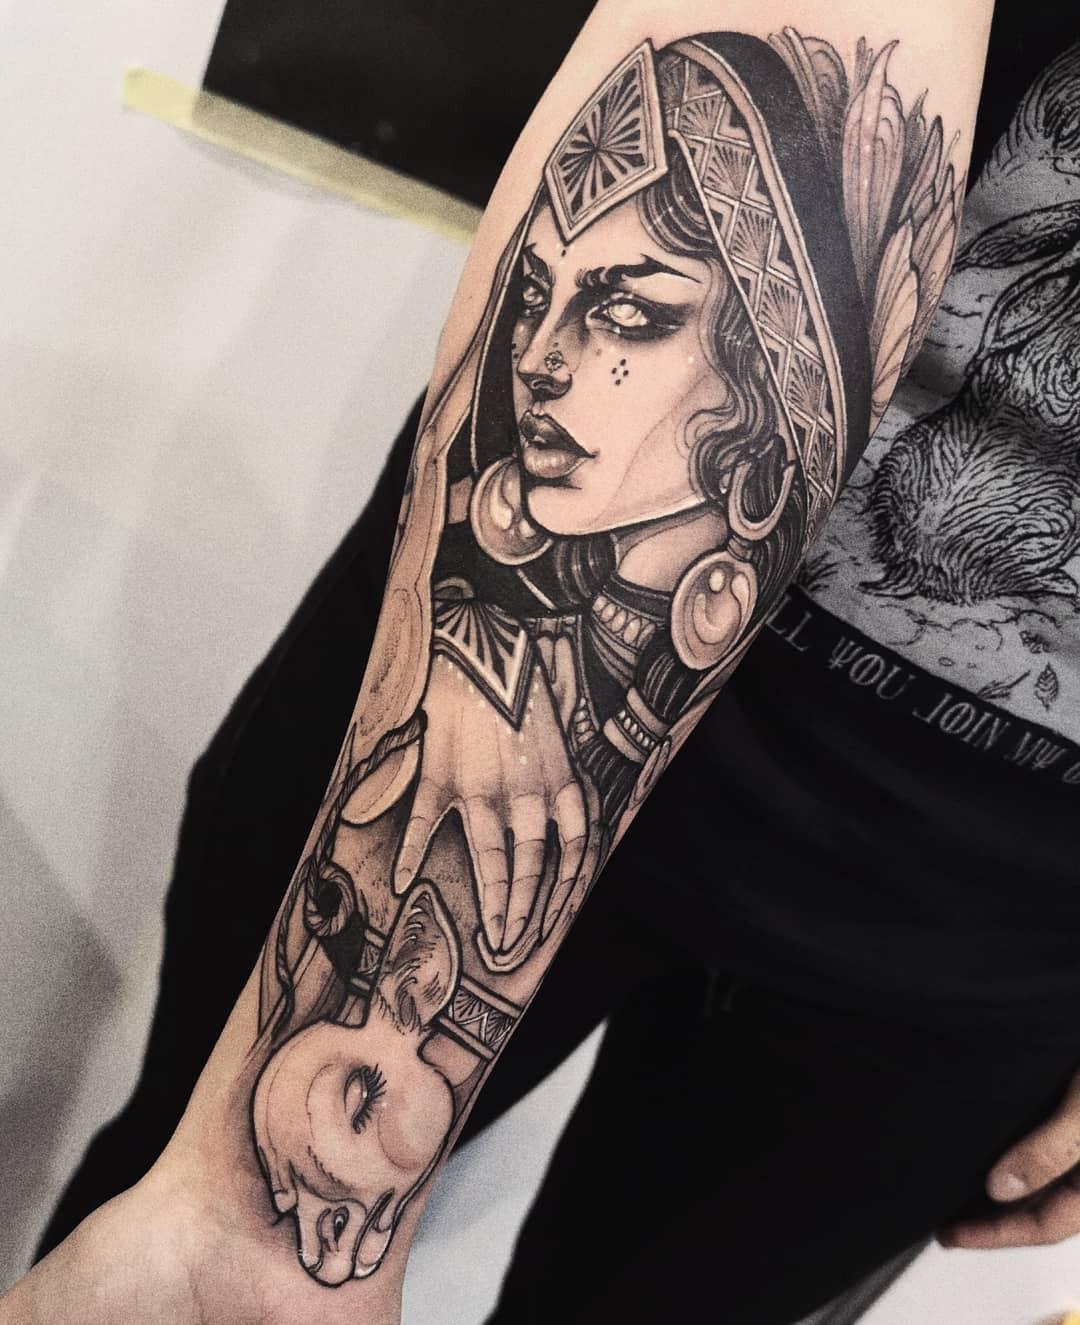 Filouino - Sacramela Tattoo inksearch tattoo